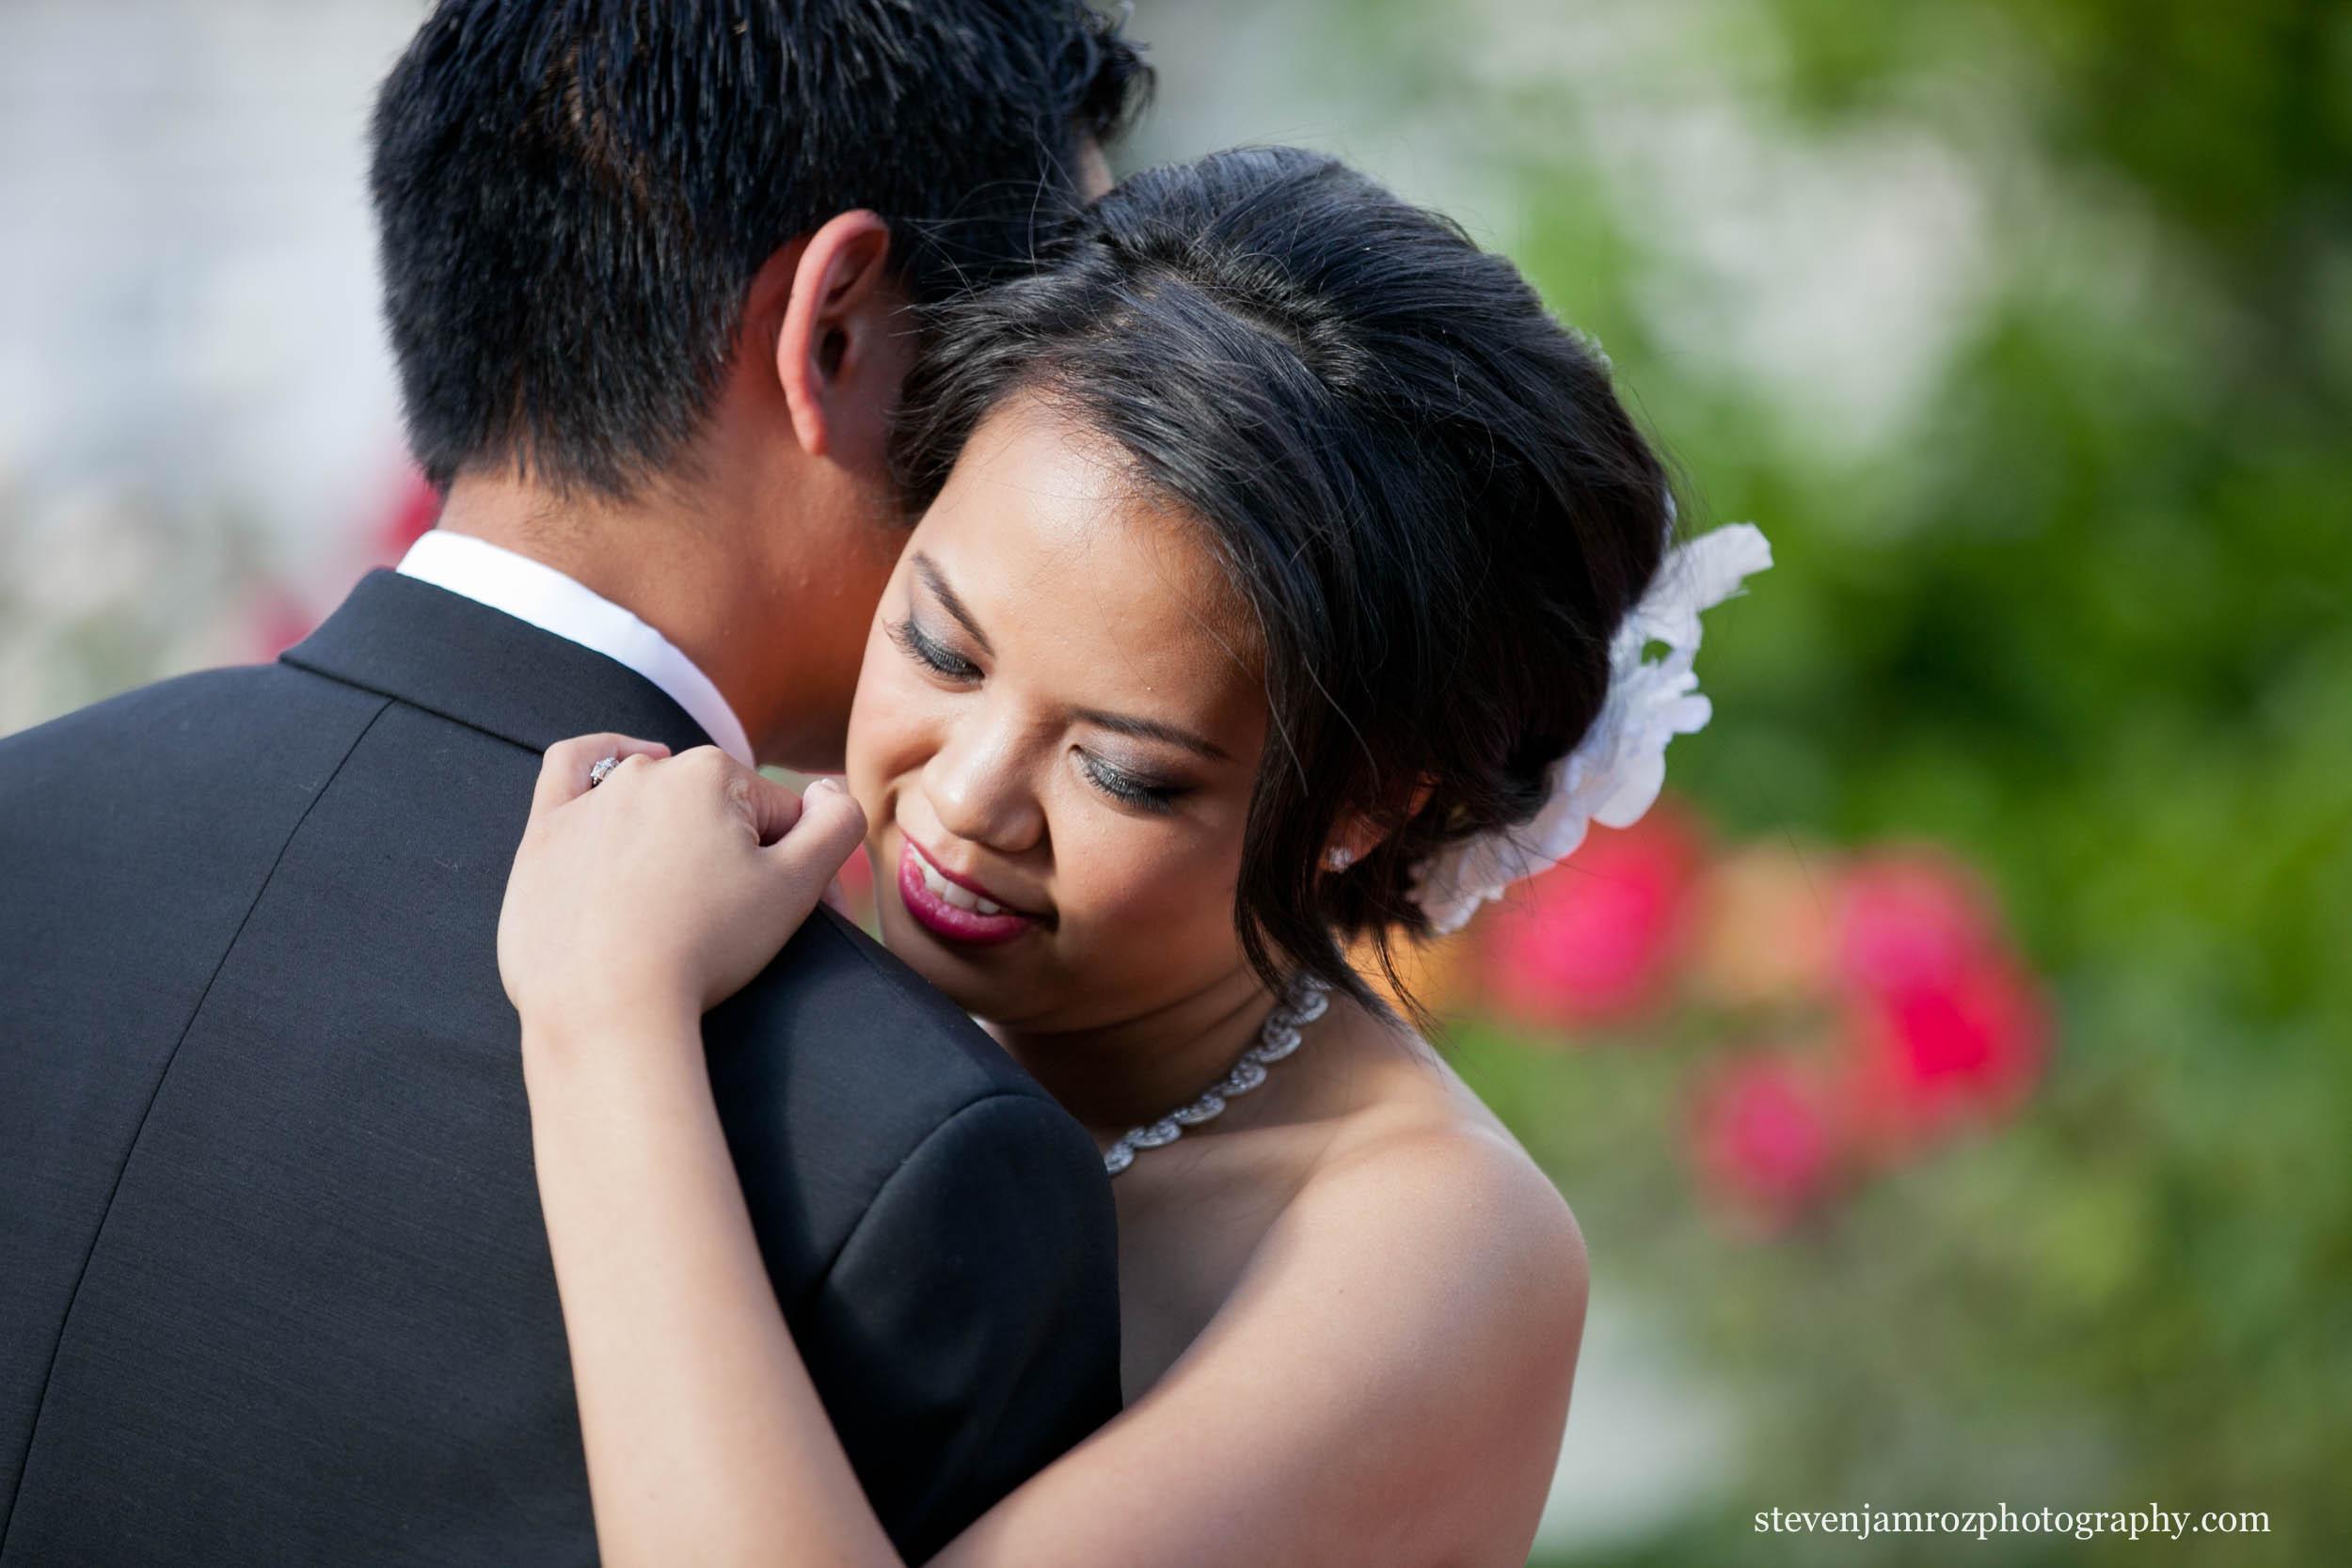 first-dance-wedding-cary-nc-steven-jamroz-photography-0352.jpg